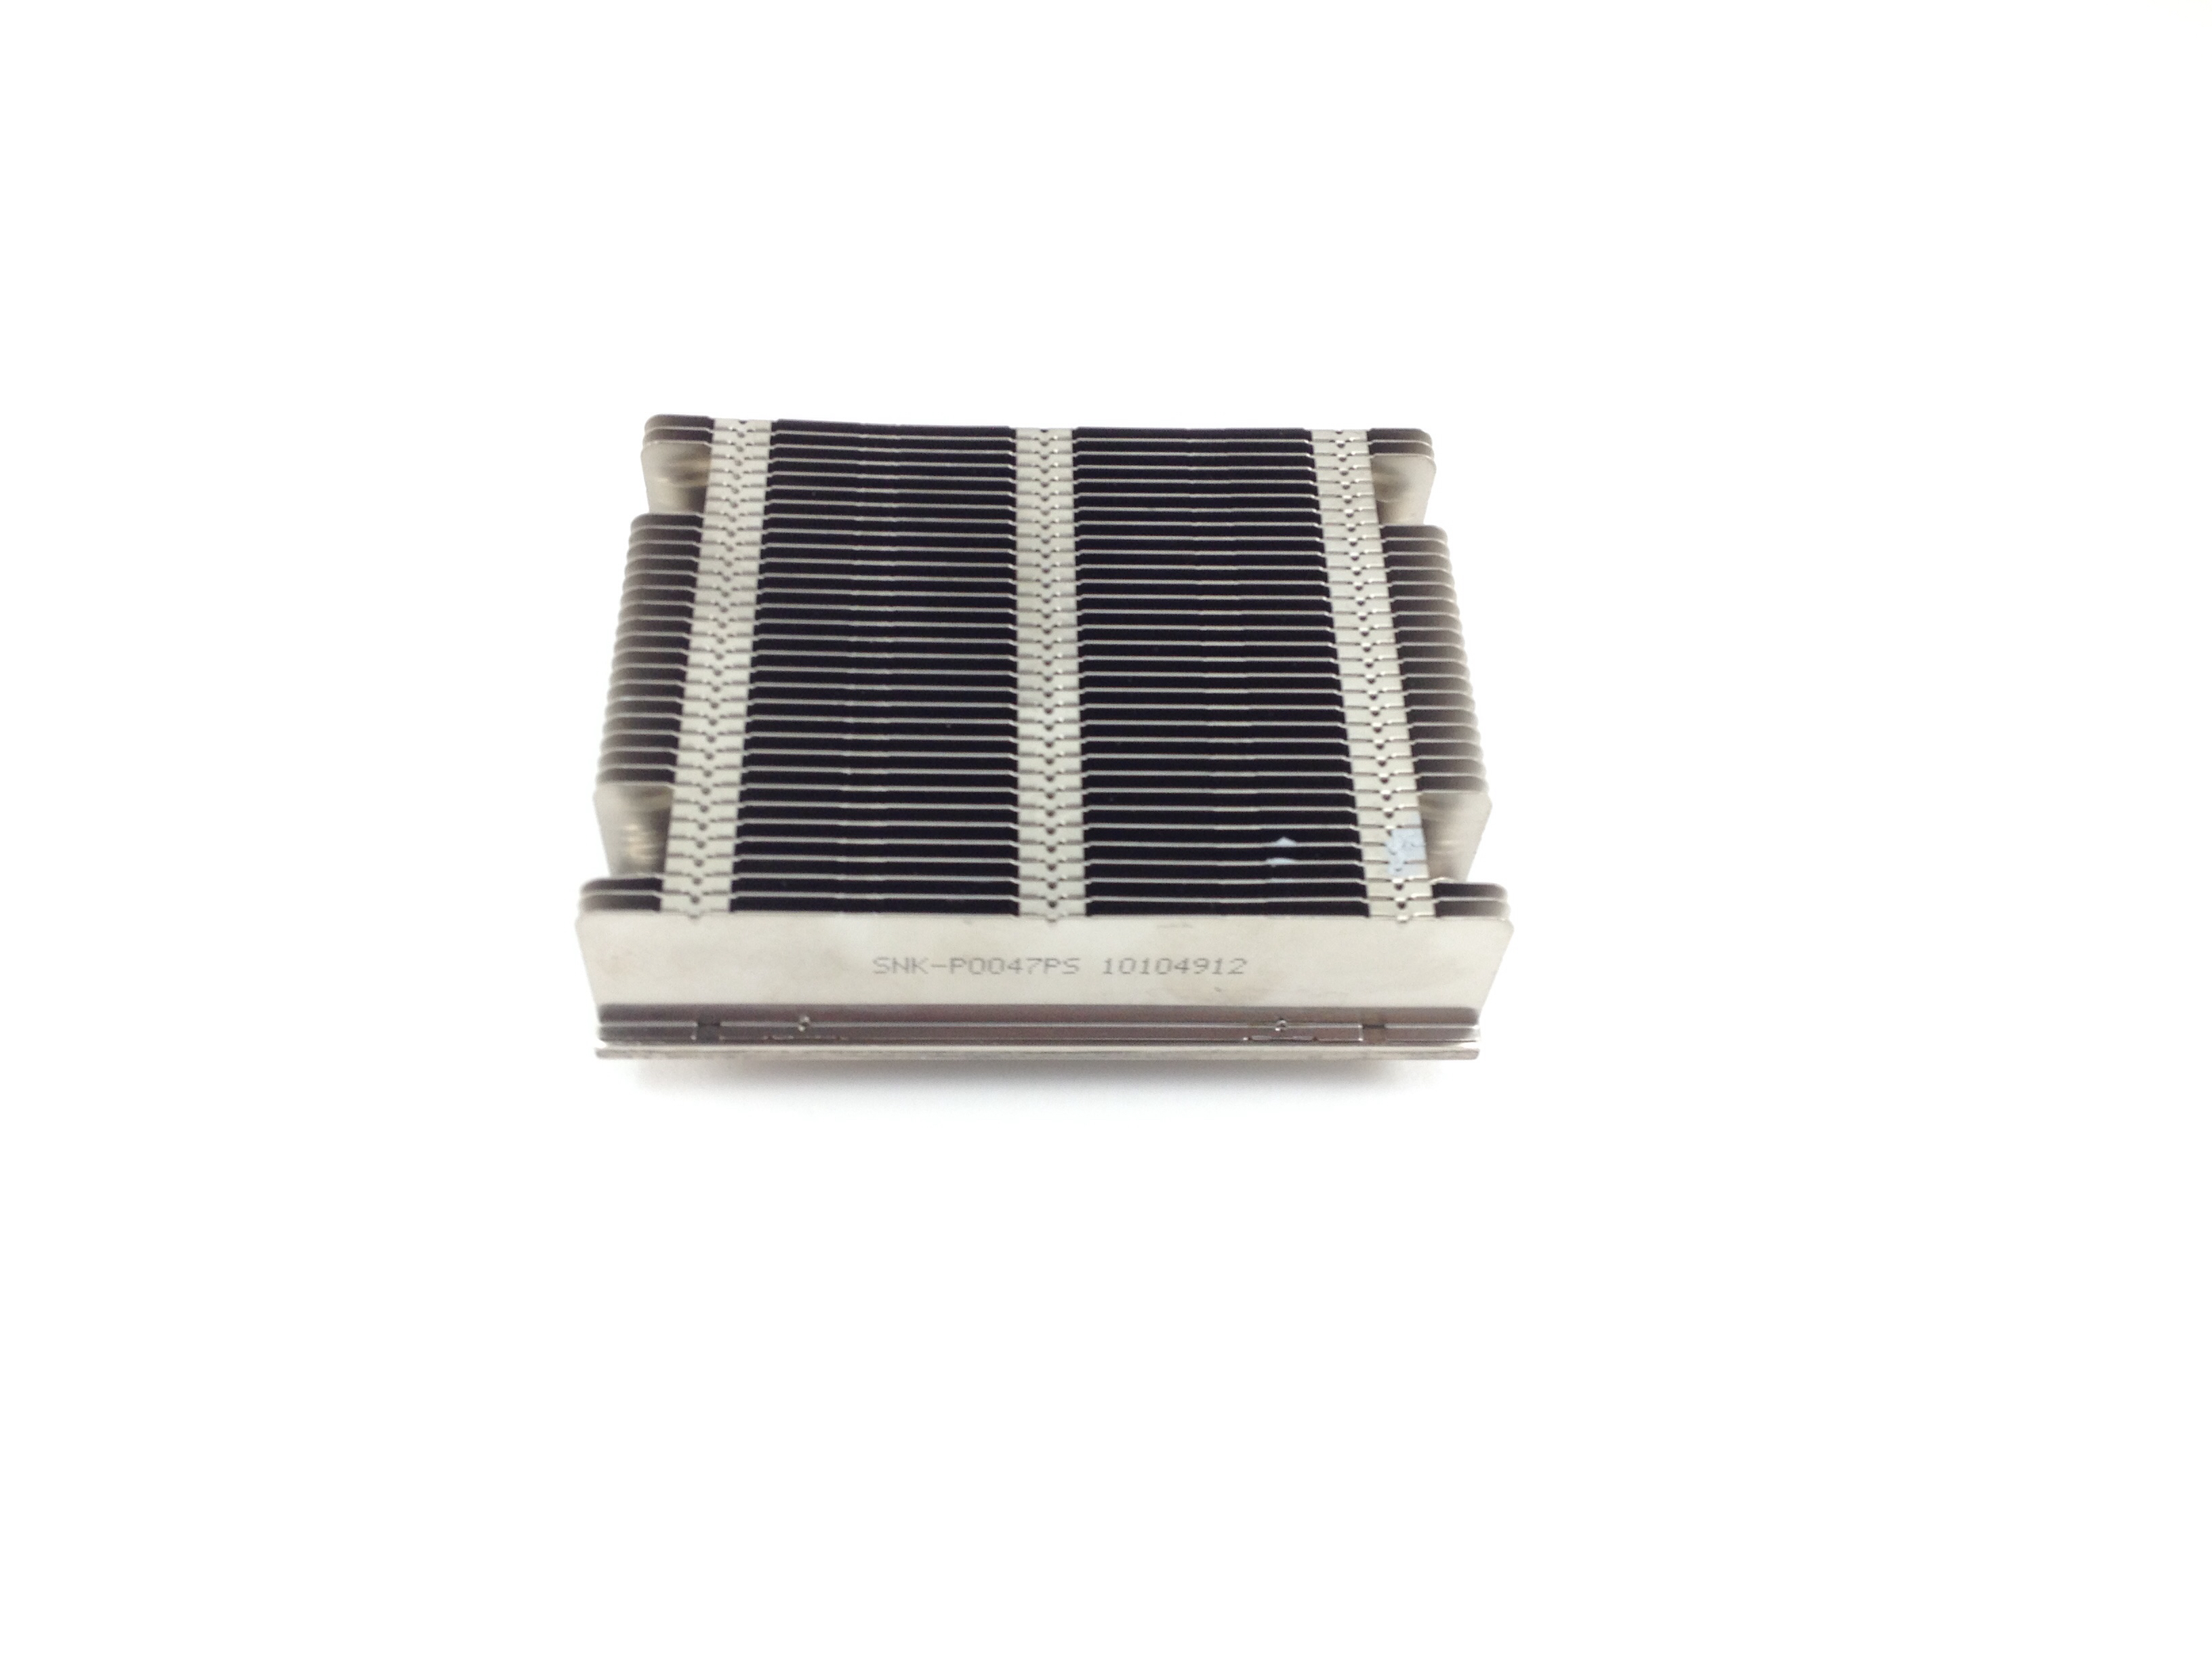 Supermicro 1U Passive CPU Heatsink For X9 X10 Systems (SNK-P0047PS)